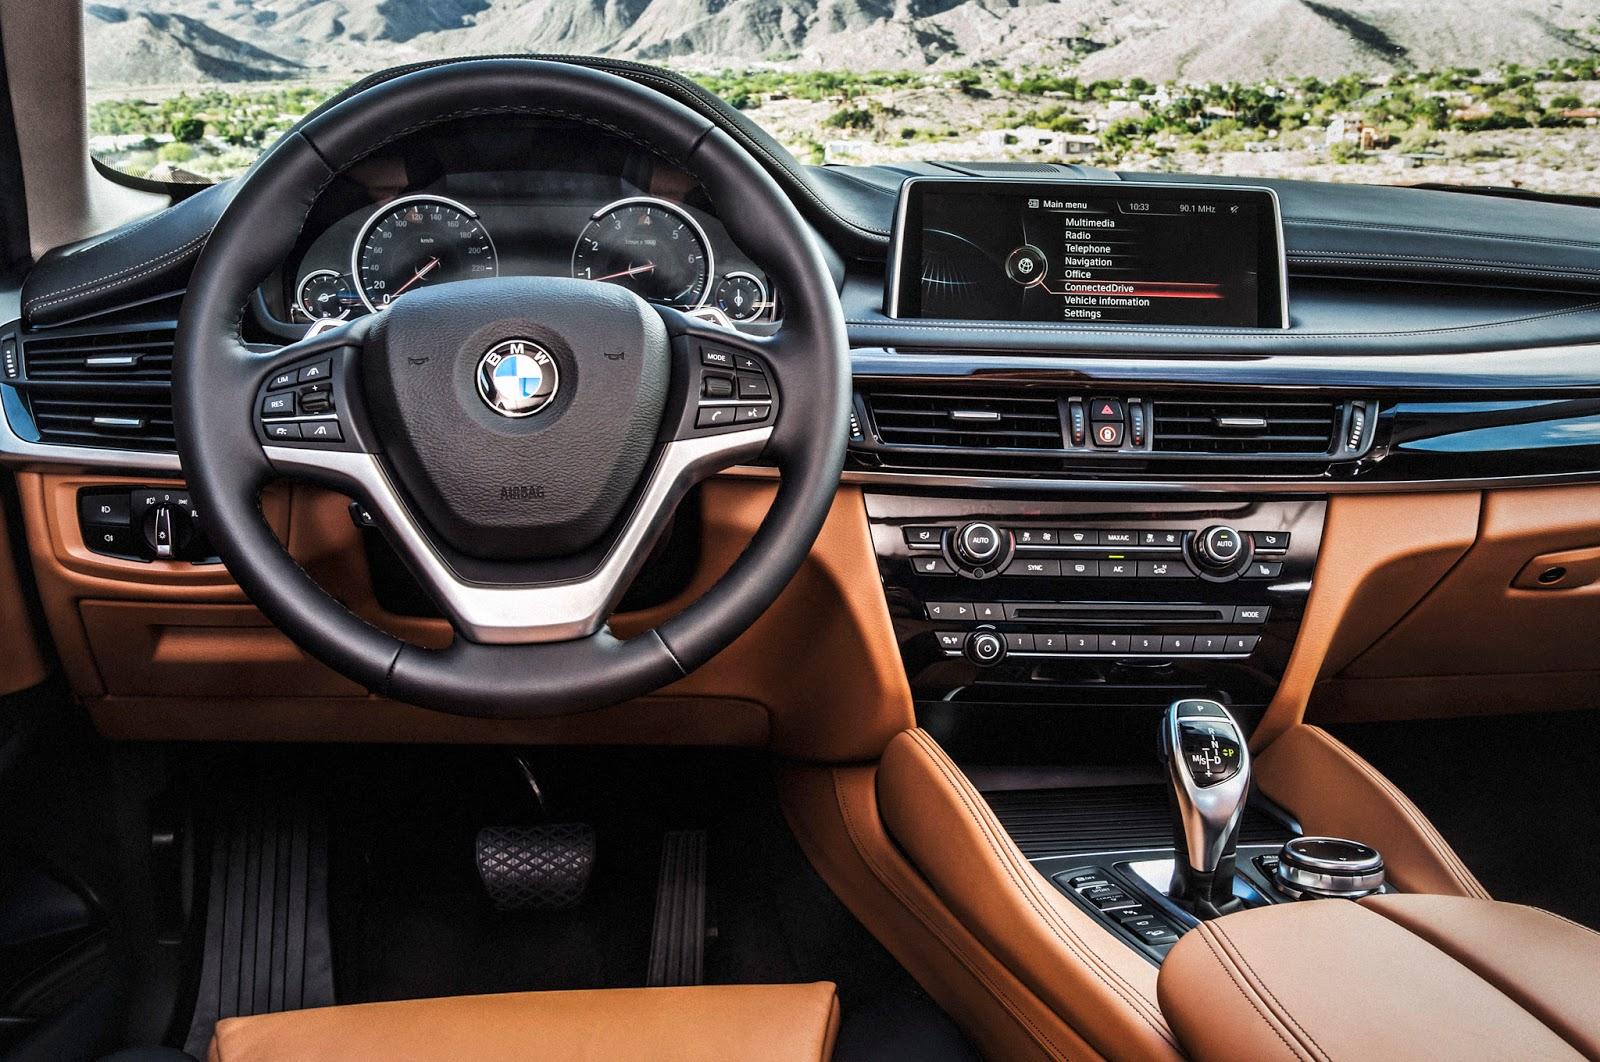 New BMW X6 Interior